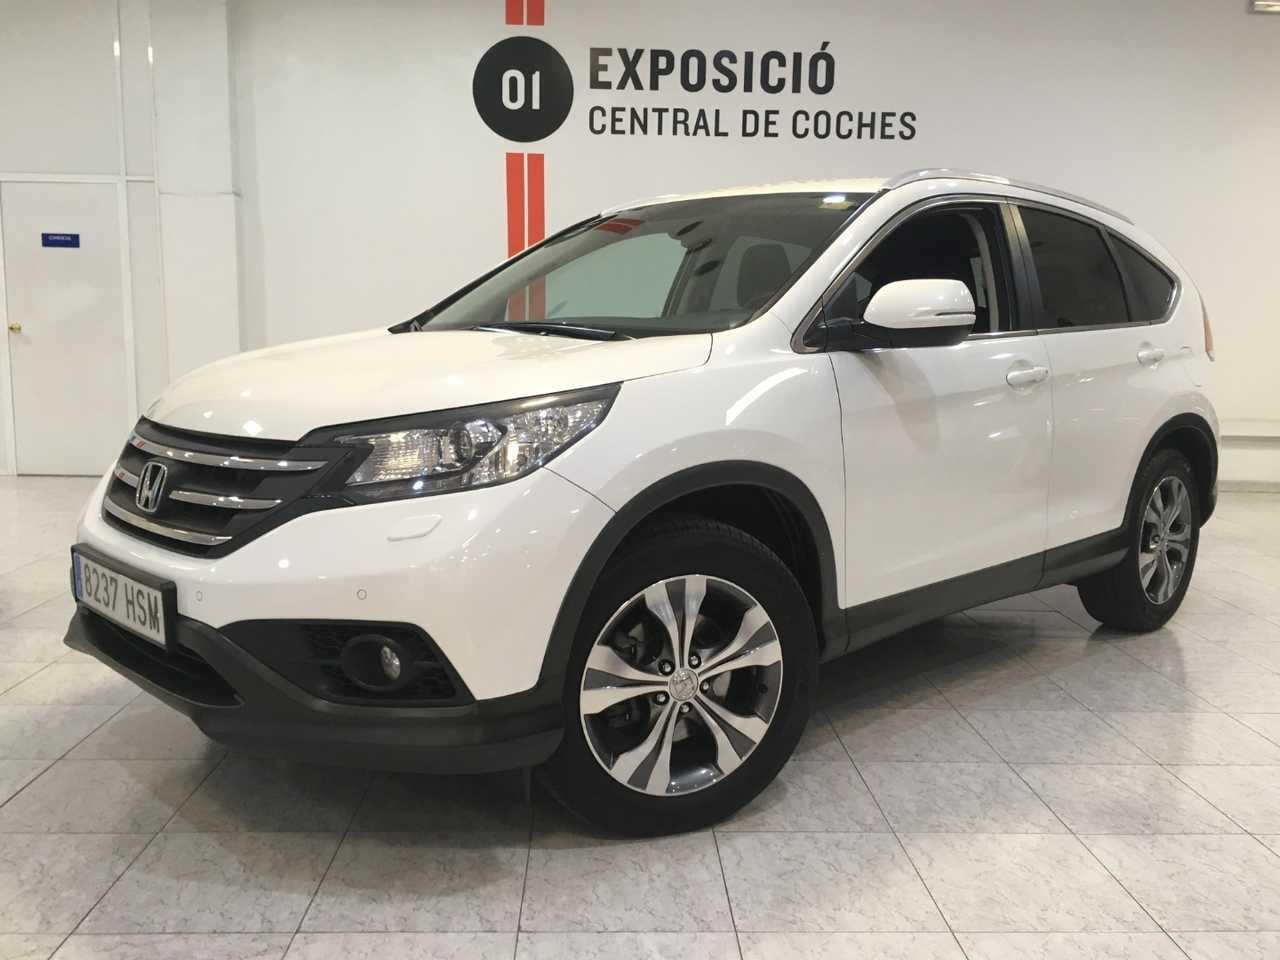 Honda CR-V 2.2 I-Dtec 4x4 Lifestyle /Navi / Xenon / Alcantara calefac. / Parktronic   - Foto 1